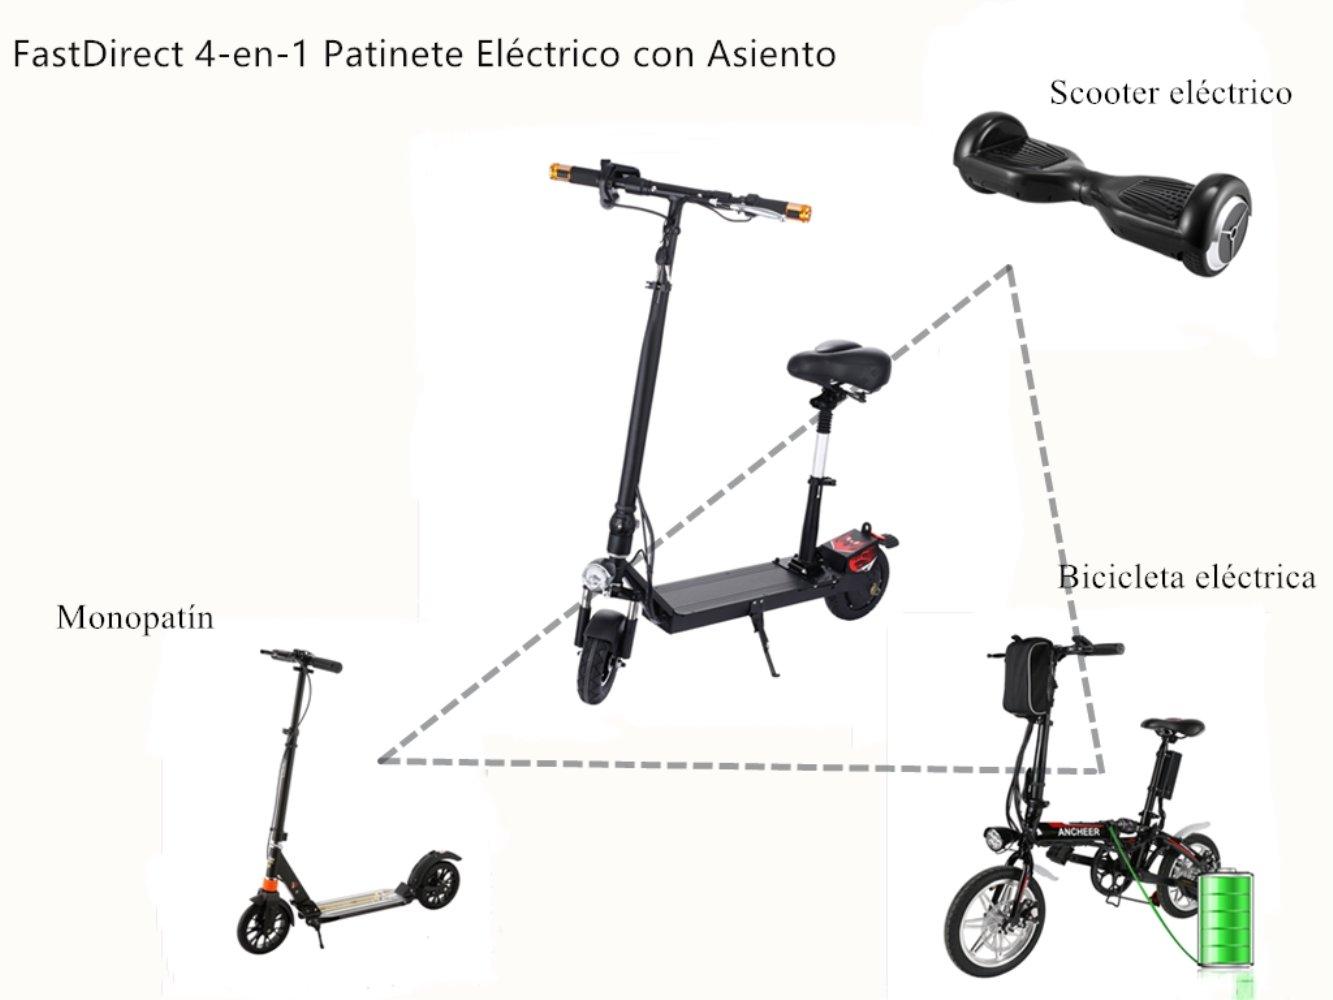 FastDirect Patinete Eléctrico para Adultos Monopatín ...